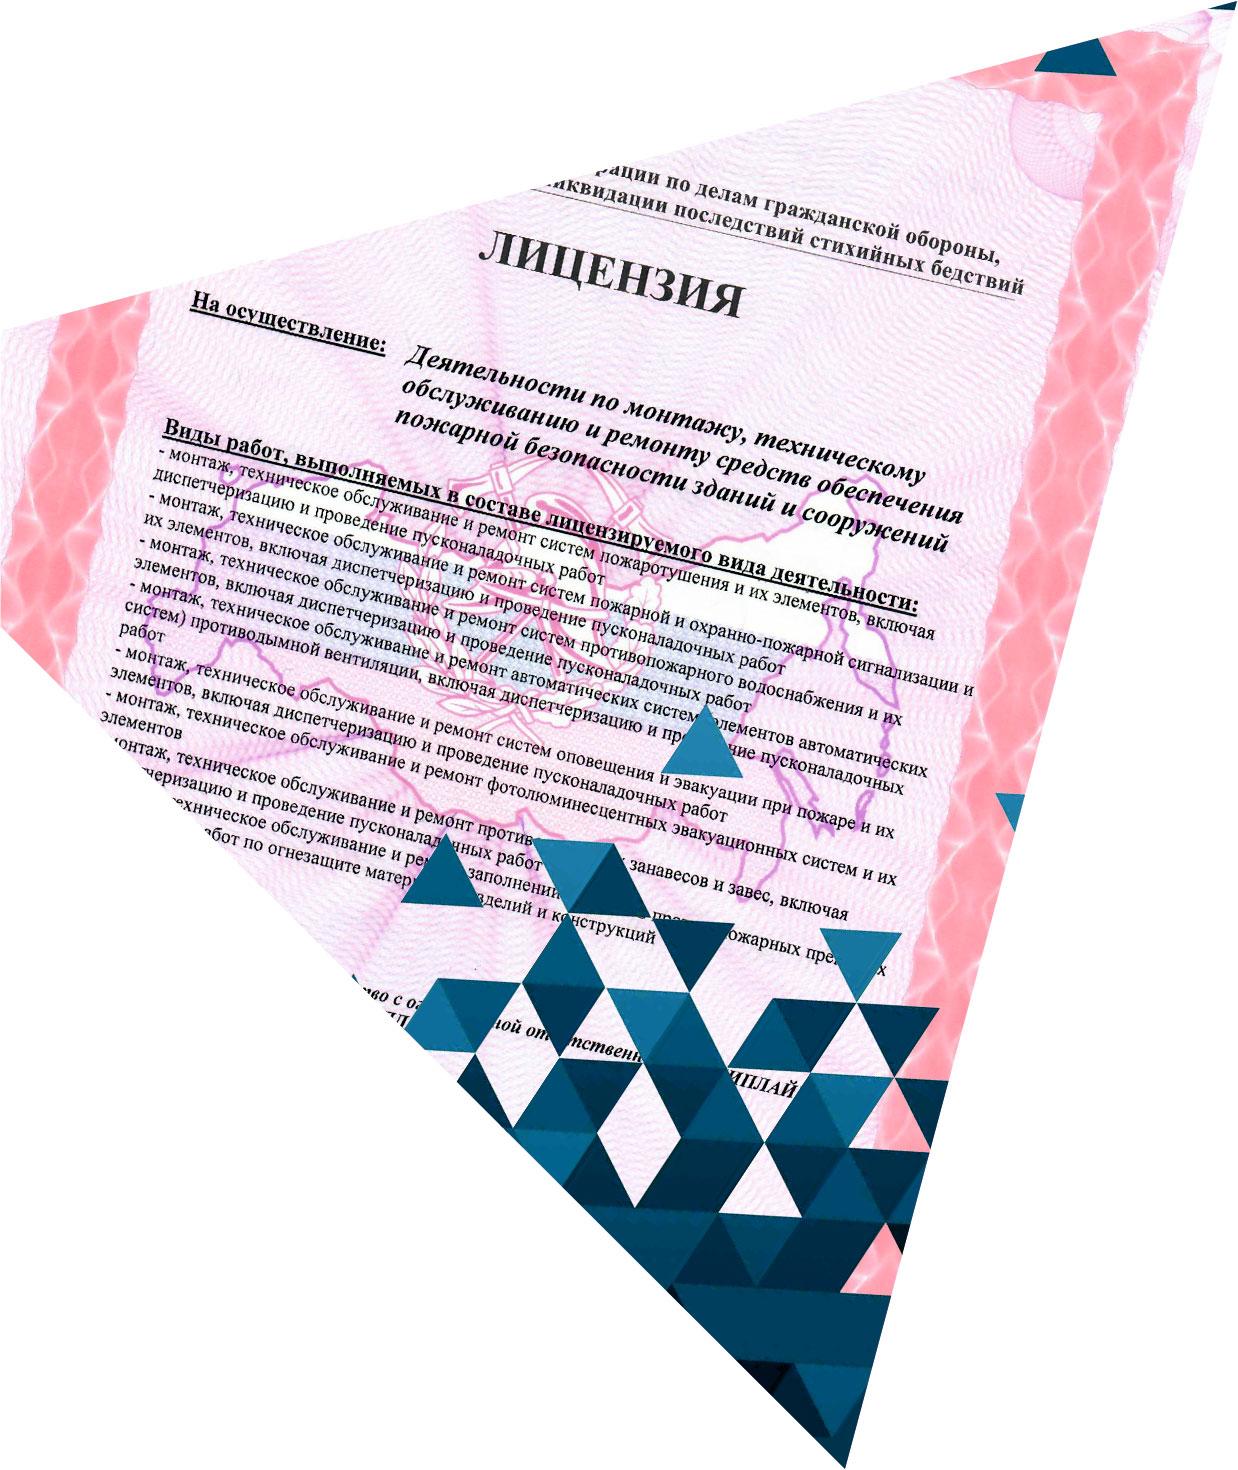 https://license-control.ru/wp-content/uploads/2020/01/456456465.jpg